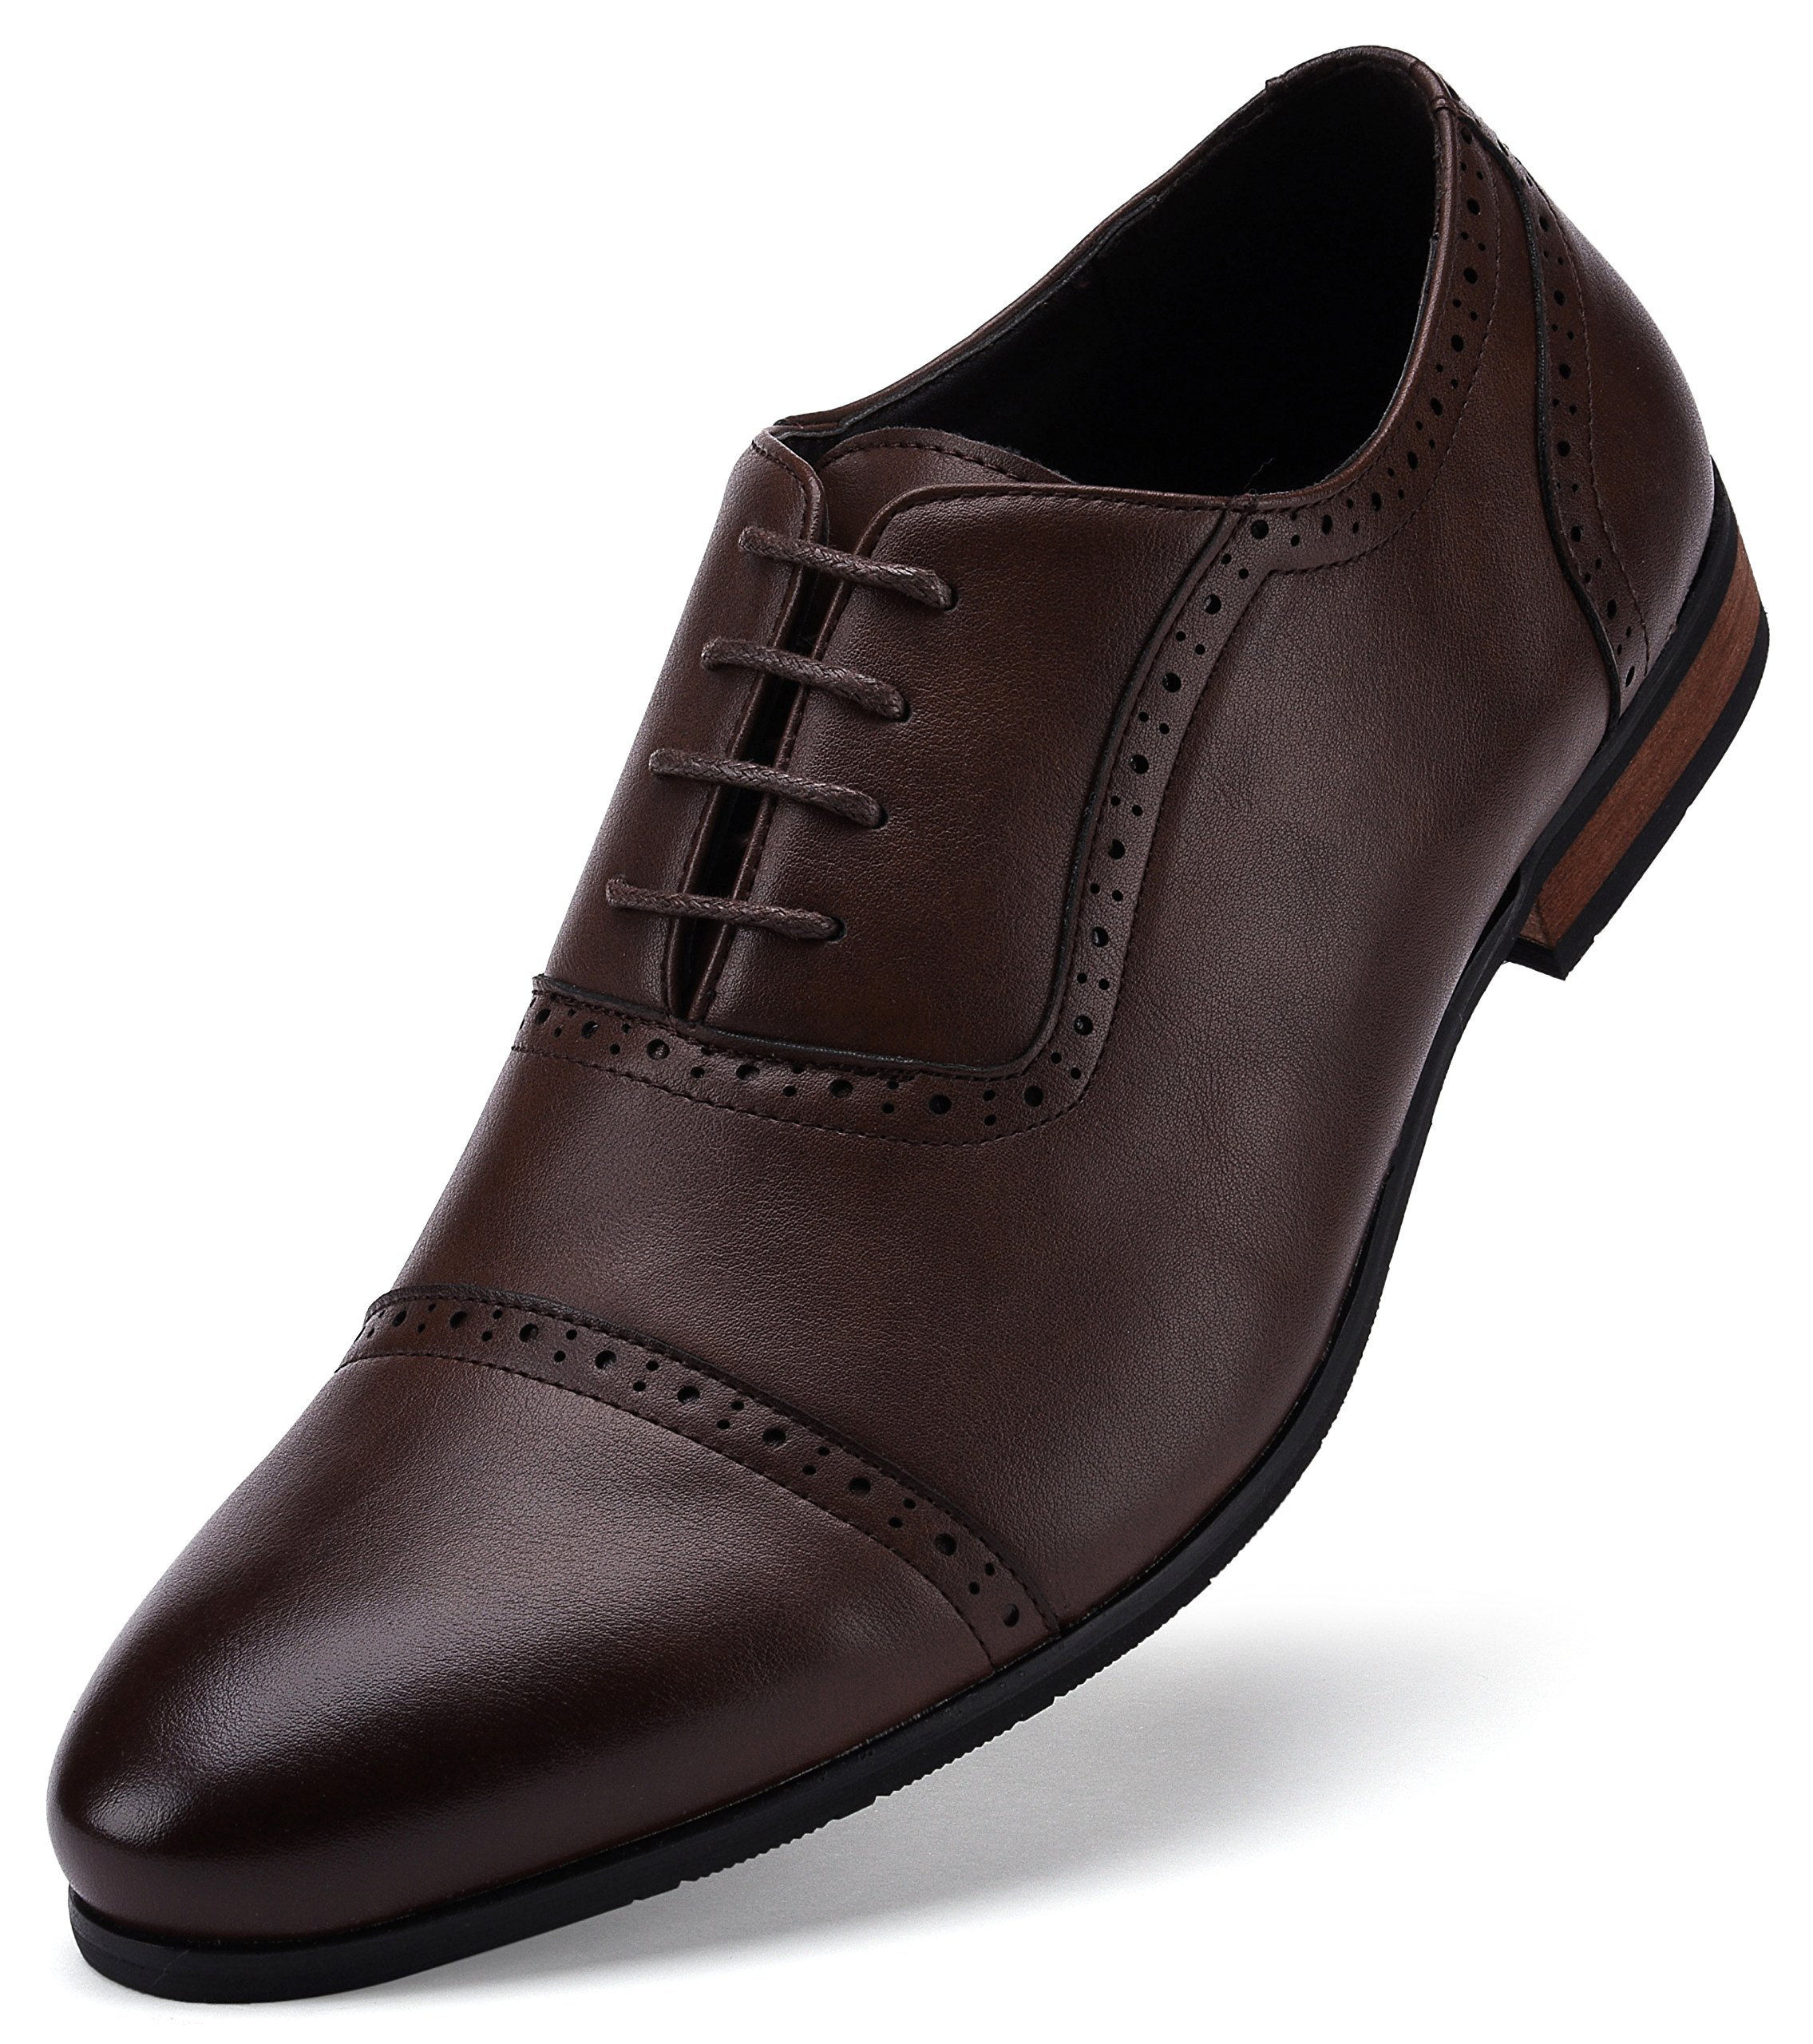 Captoe Design Oxford Shoe Chocolate Brown US-8.5D(M) | UK-41-42 | EU-8